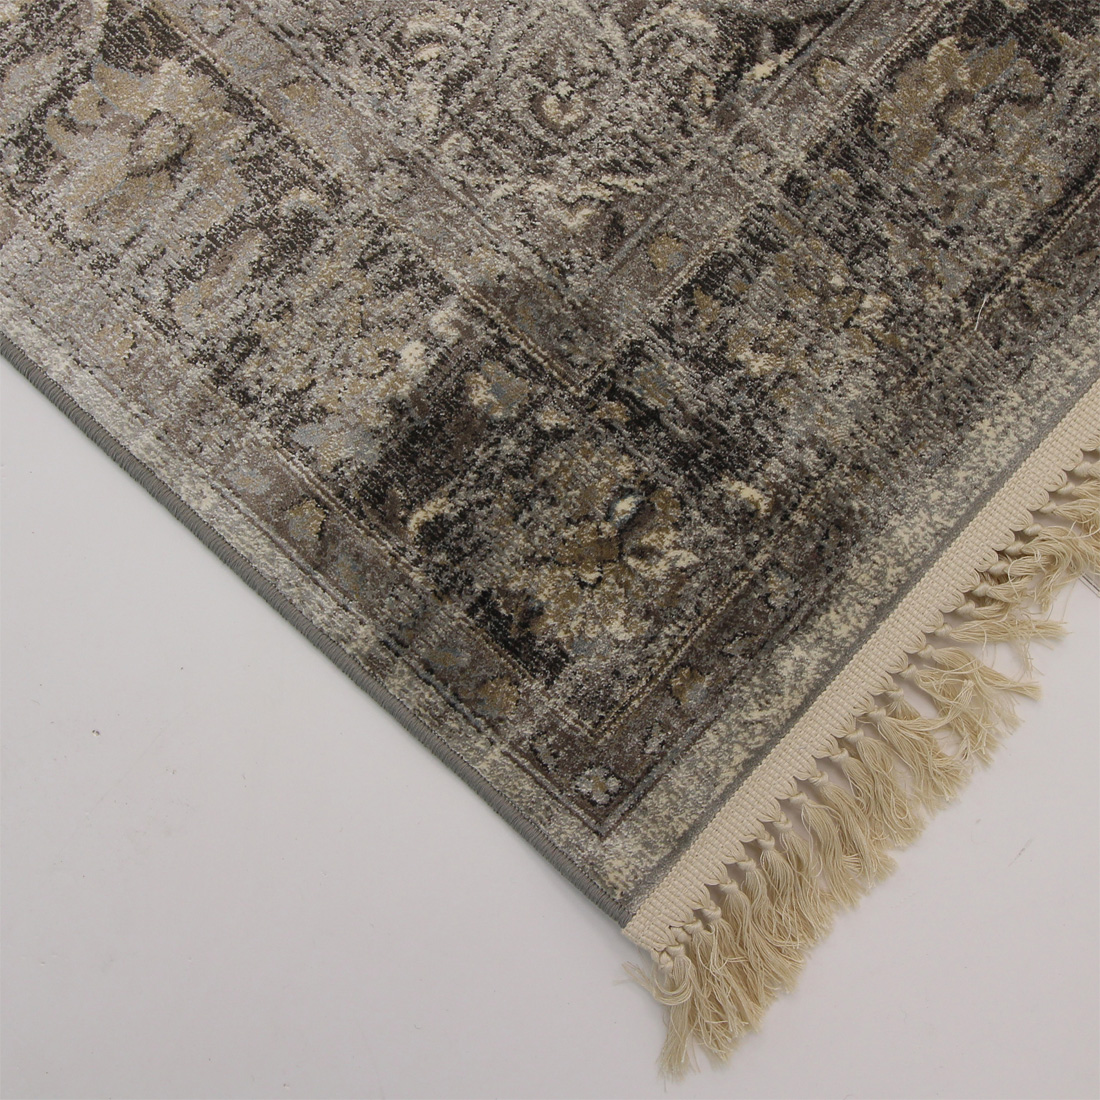 Vloerkleed Xilento Vintage Viscose Grey Beige | 160 x 230 cm